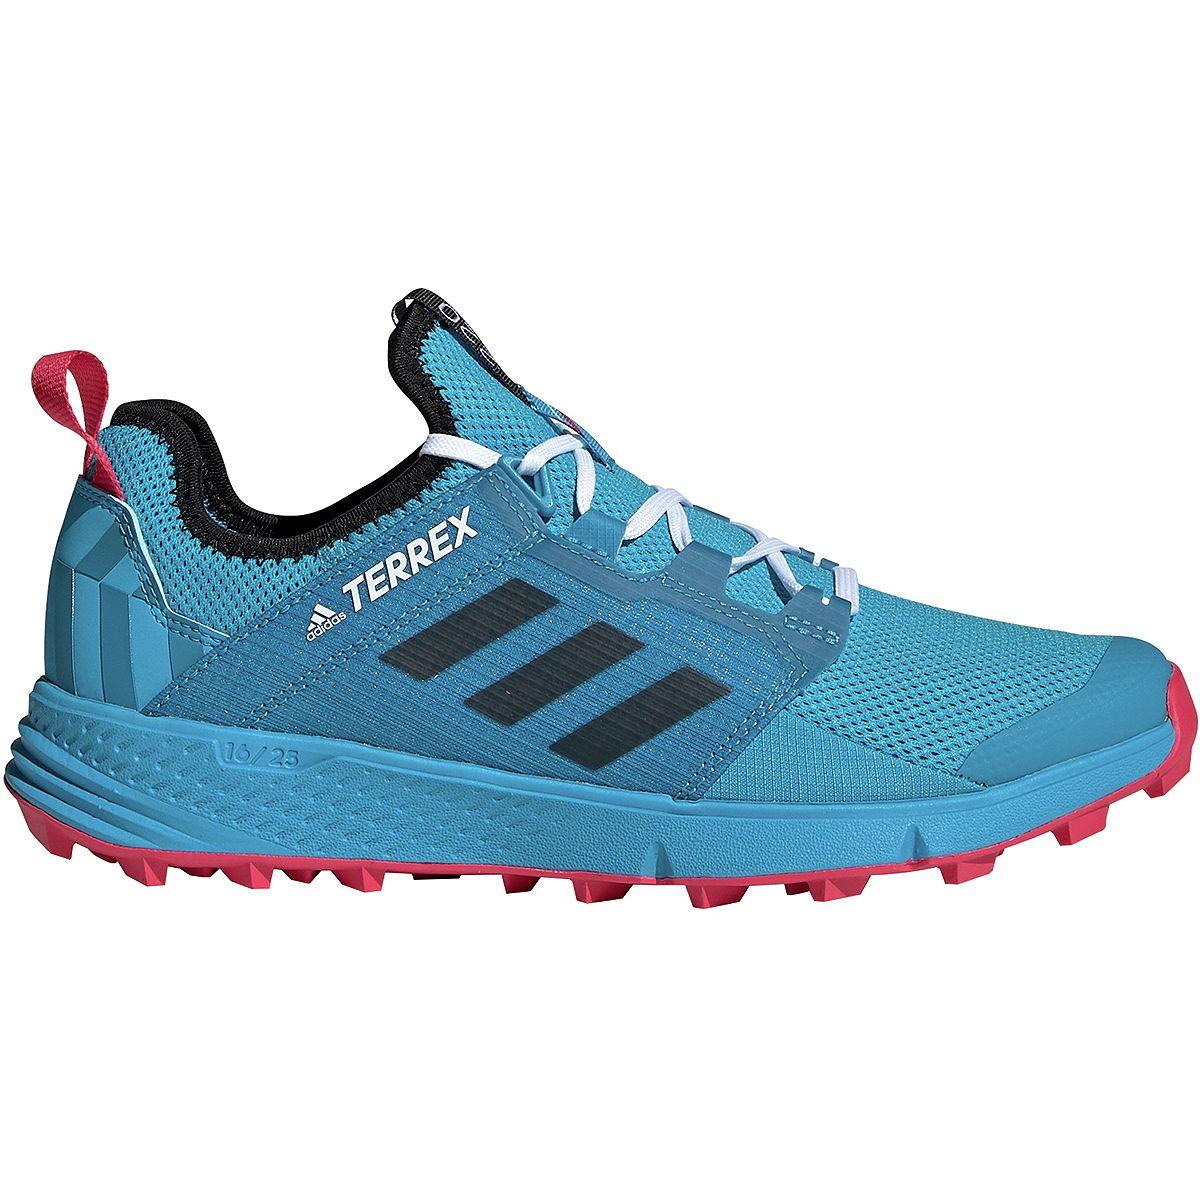 Adidas Terrex Agravic Speed Plus